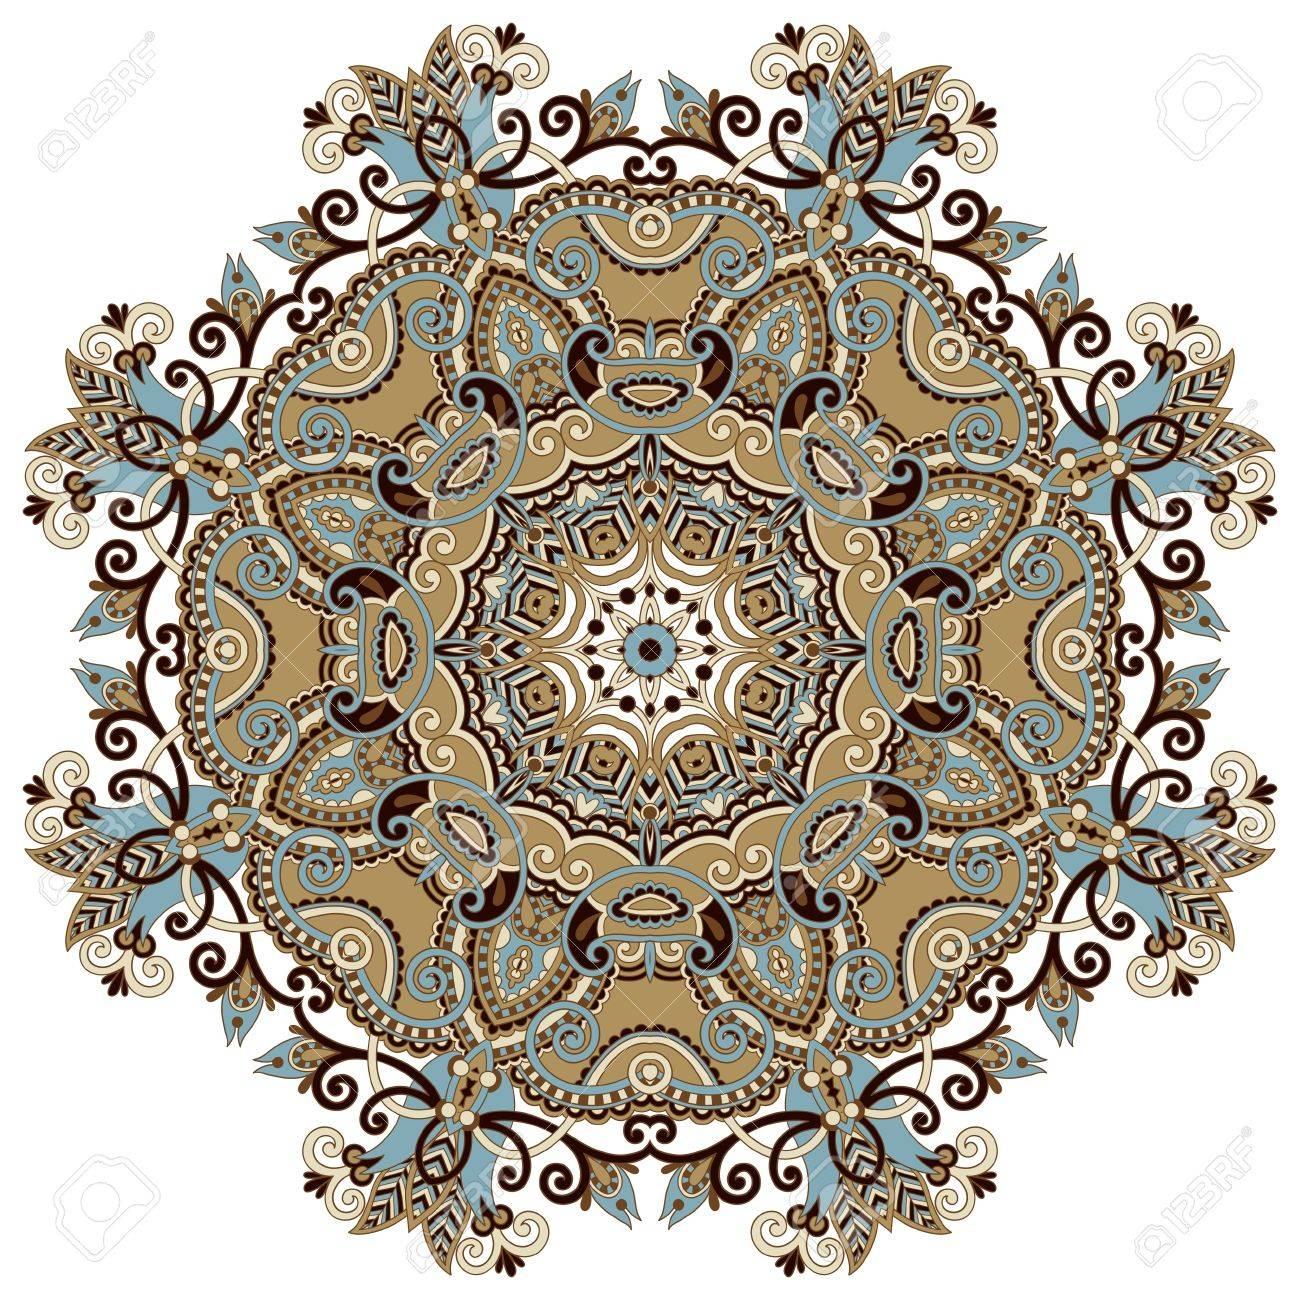 Circle ornament, ornamental round lace Stock Vector - 16635259